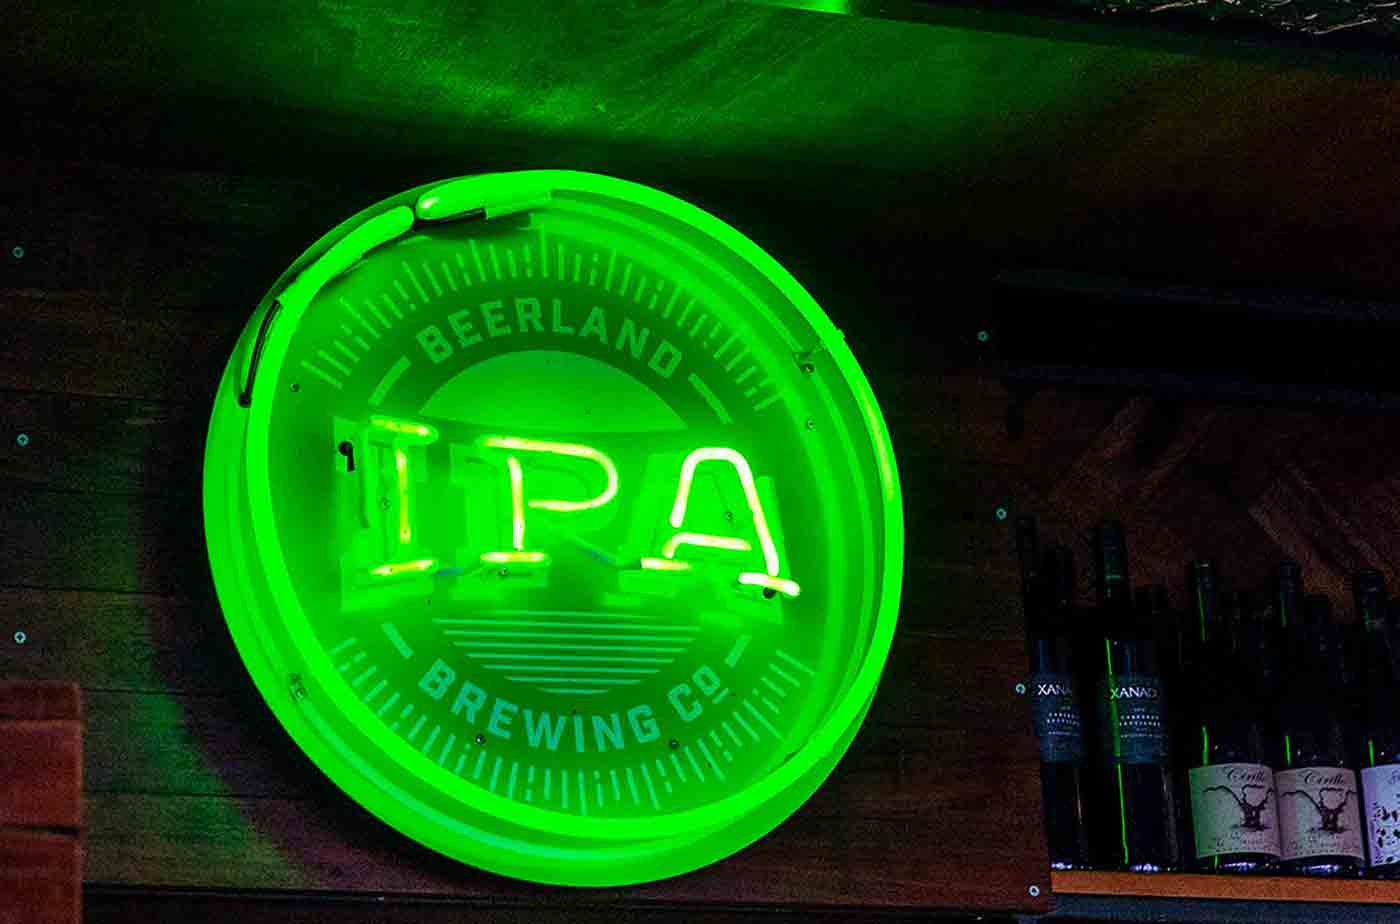 Northbridge Brewing Company Beerland IPA